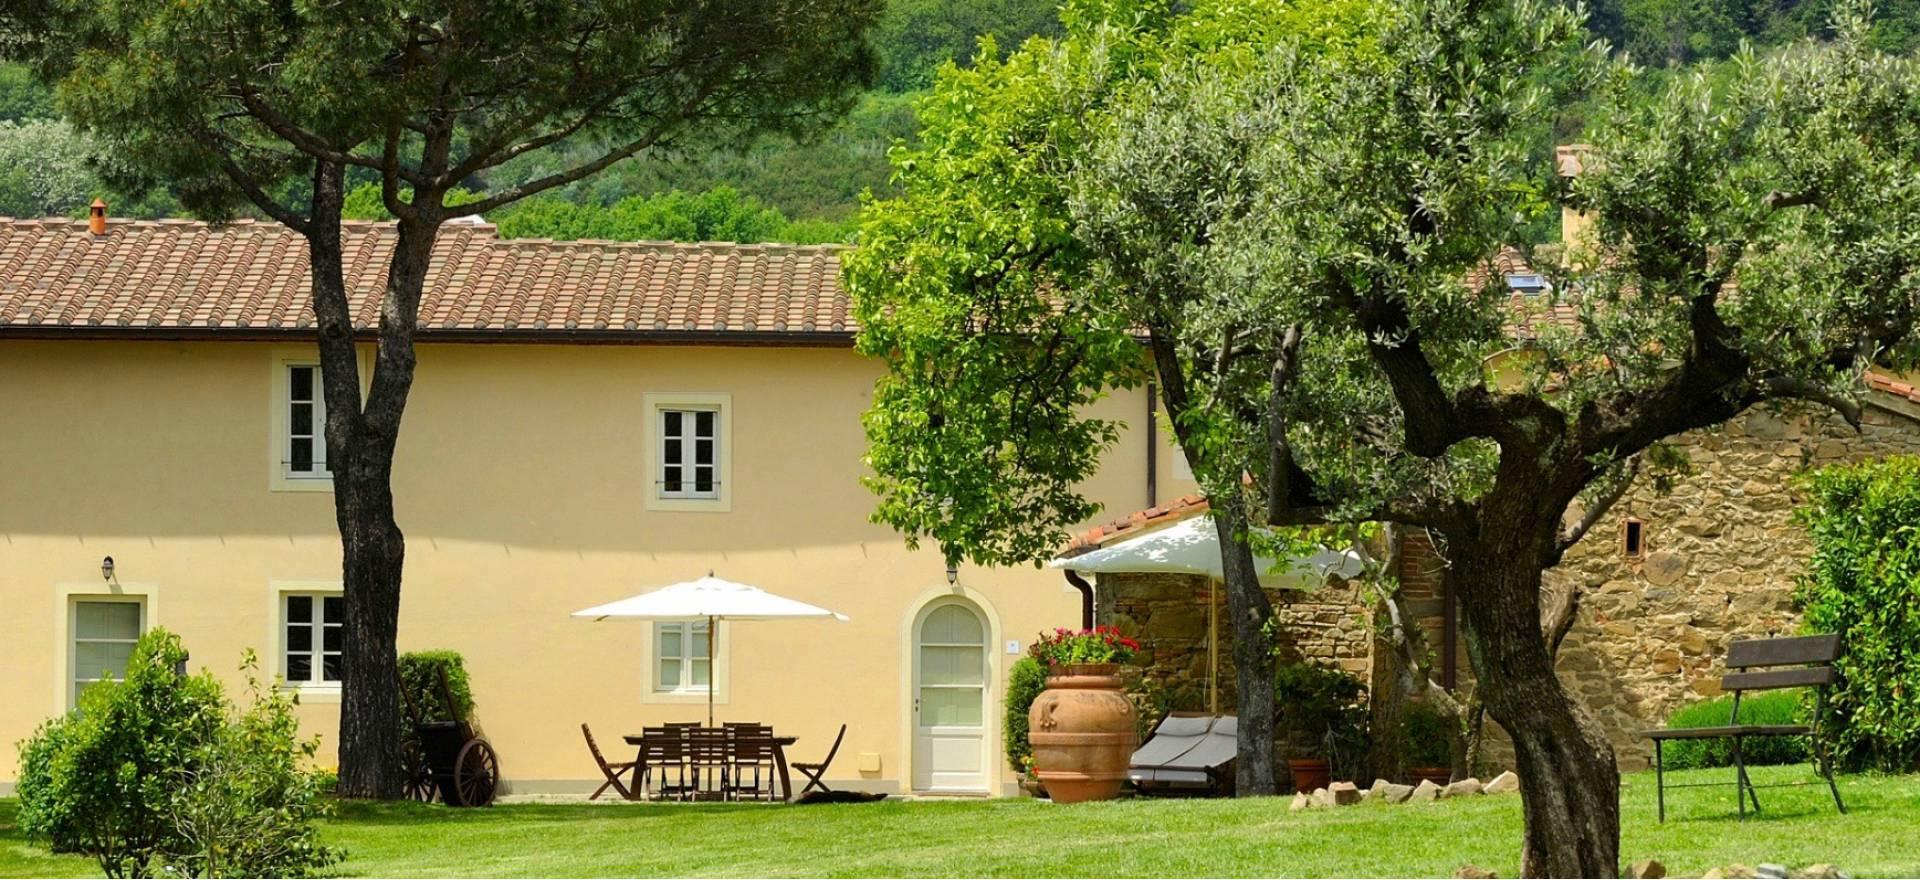 Agriturismo Toscana Agriturismo Toscana, per famiglie, elegante e popolare!